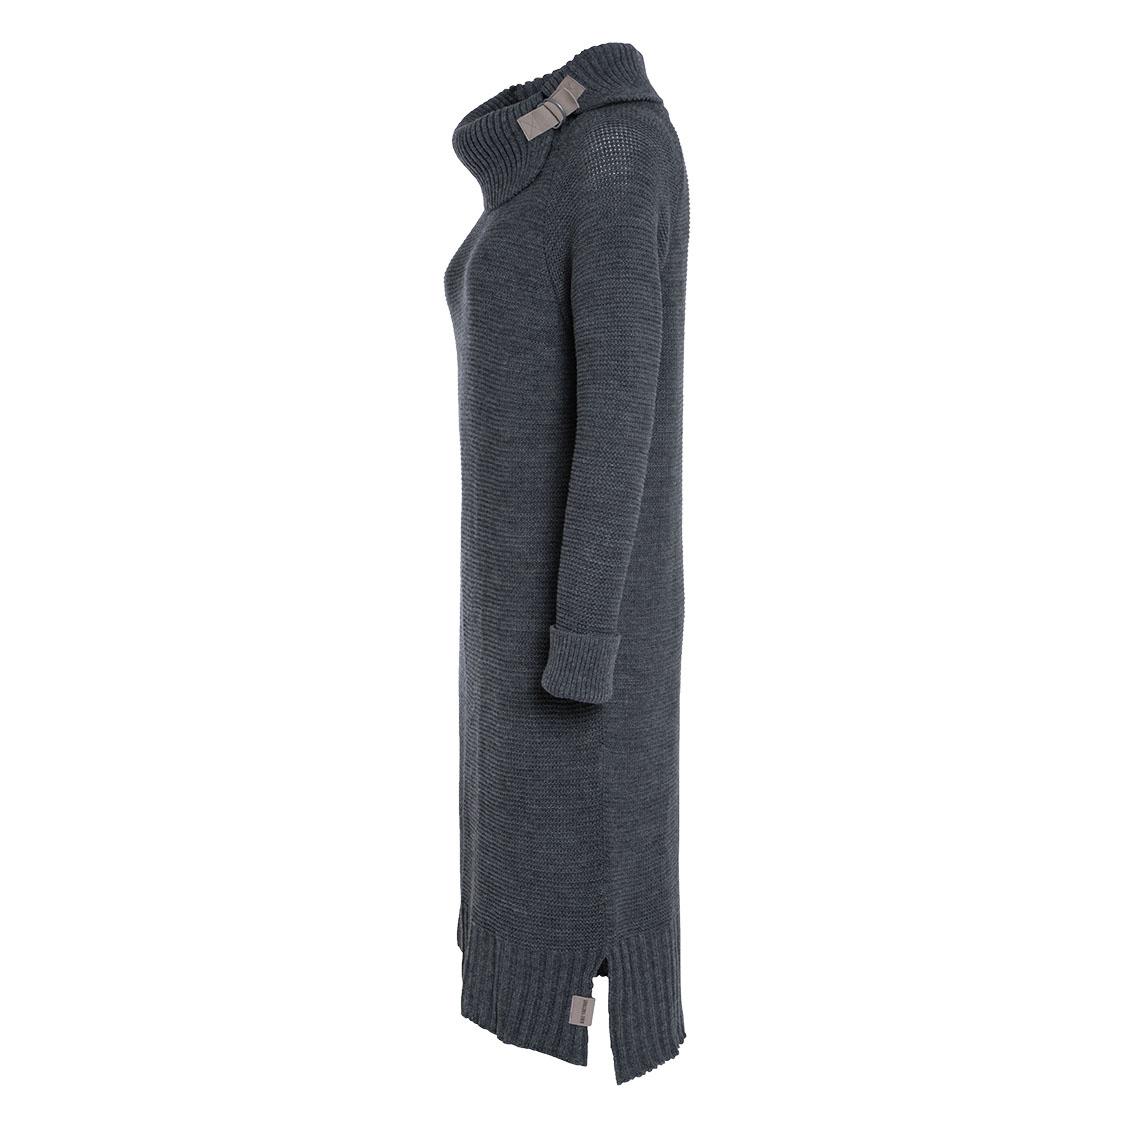 jamie knitted dress aubergine 4042